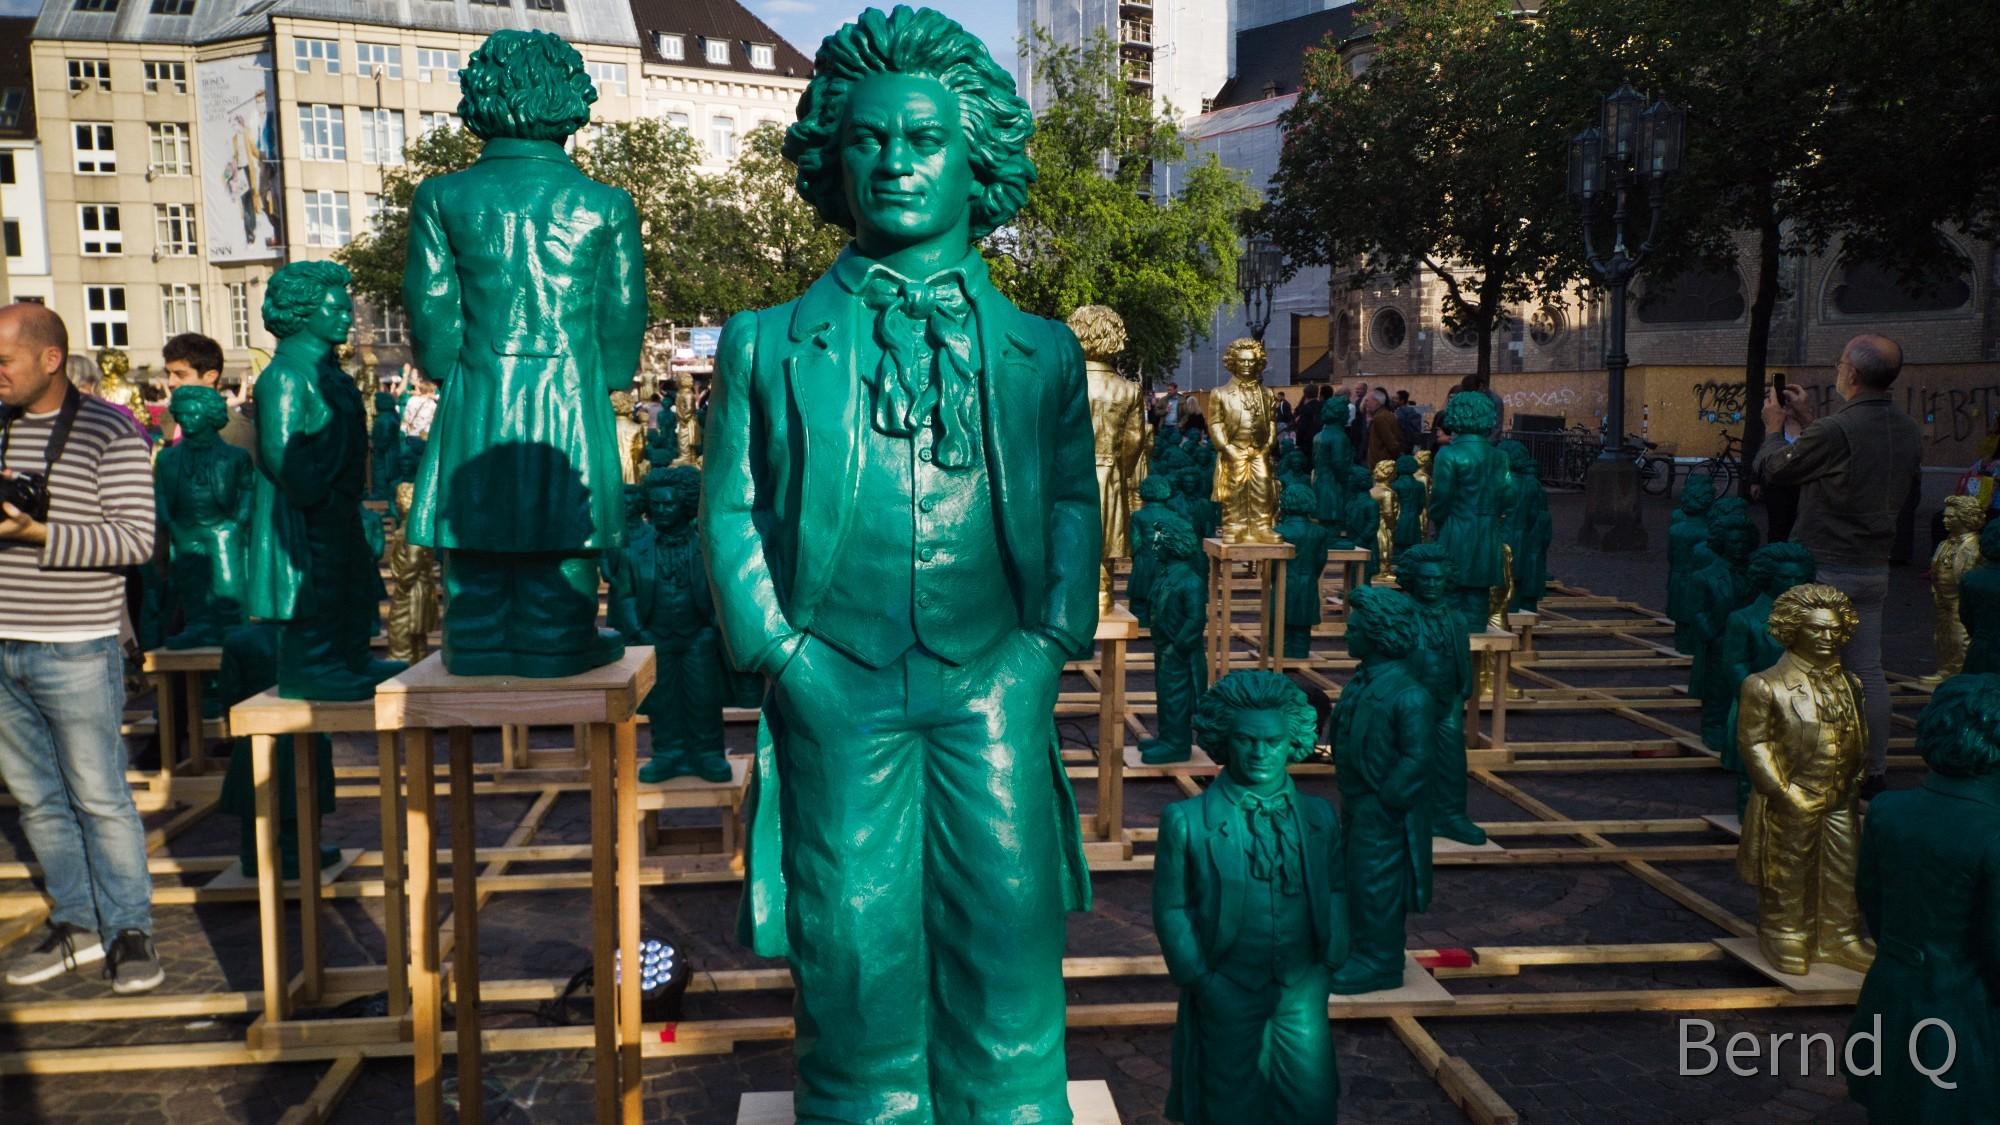 Beethoven in Grün